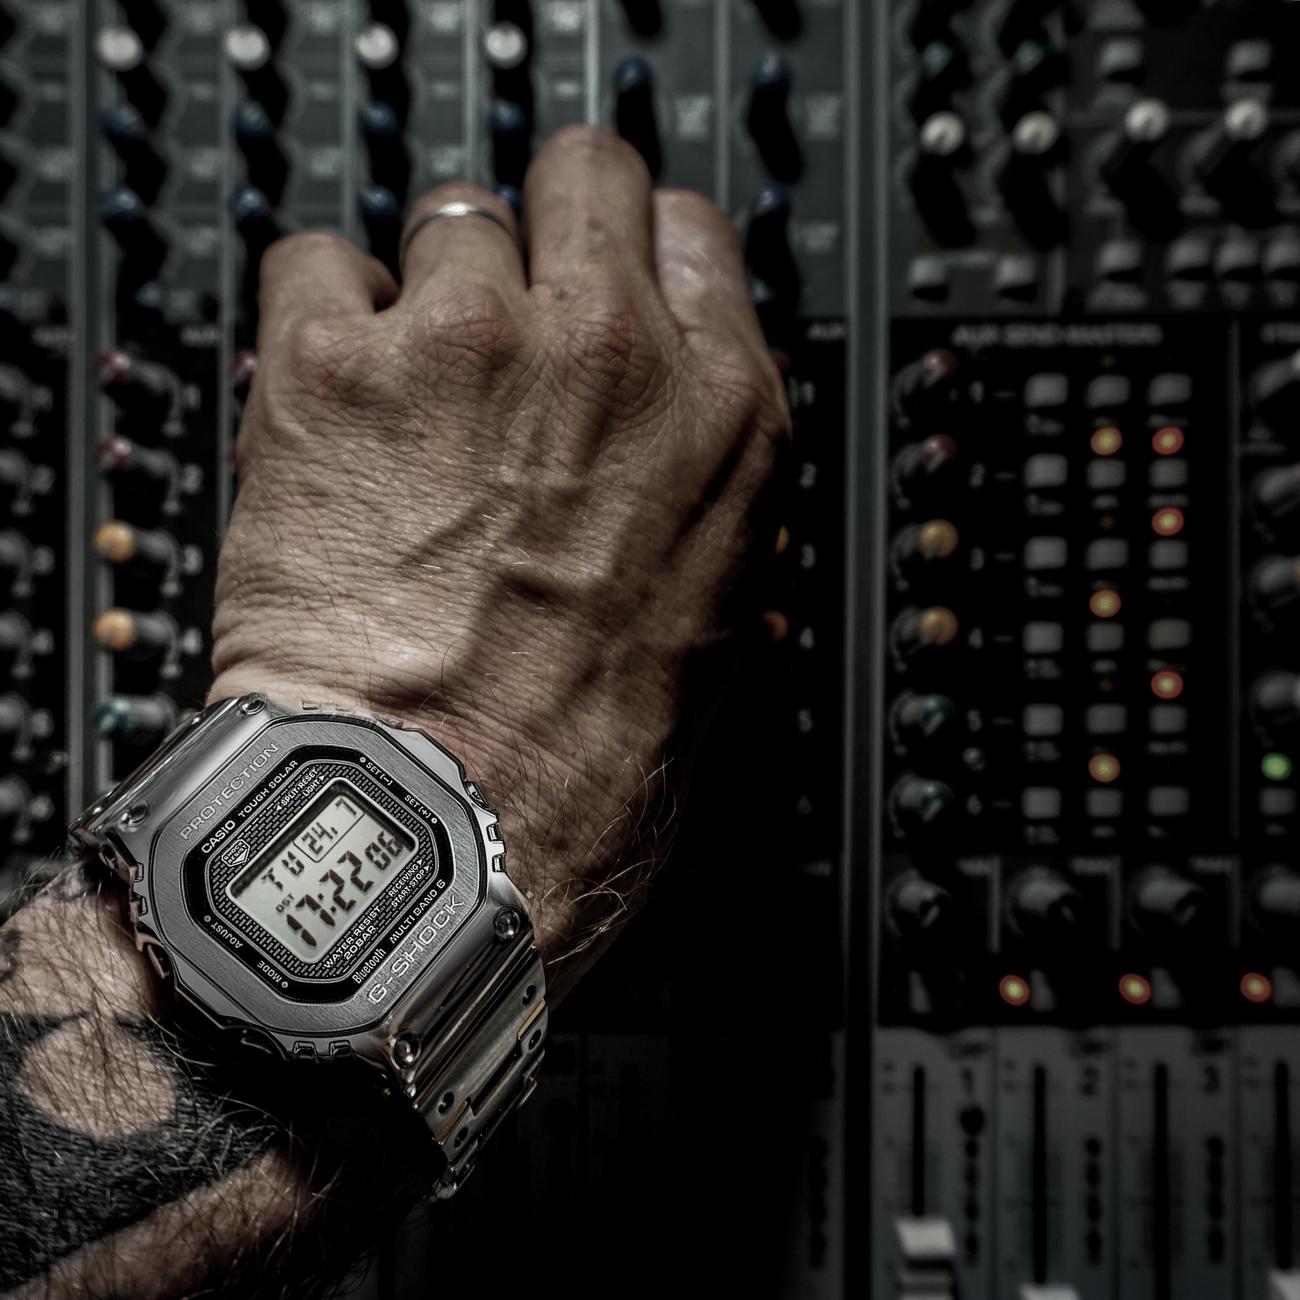 Zegarek męski Casio g-shock specials GMW-B5000D-1ER - duże 7